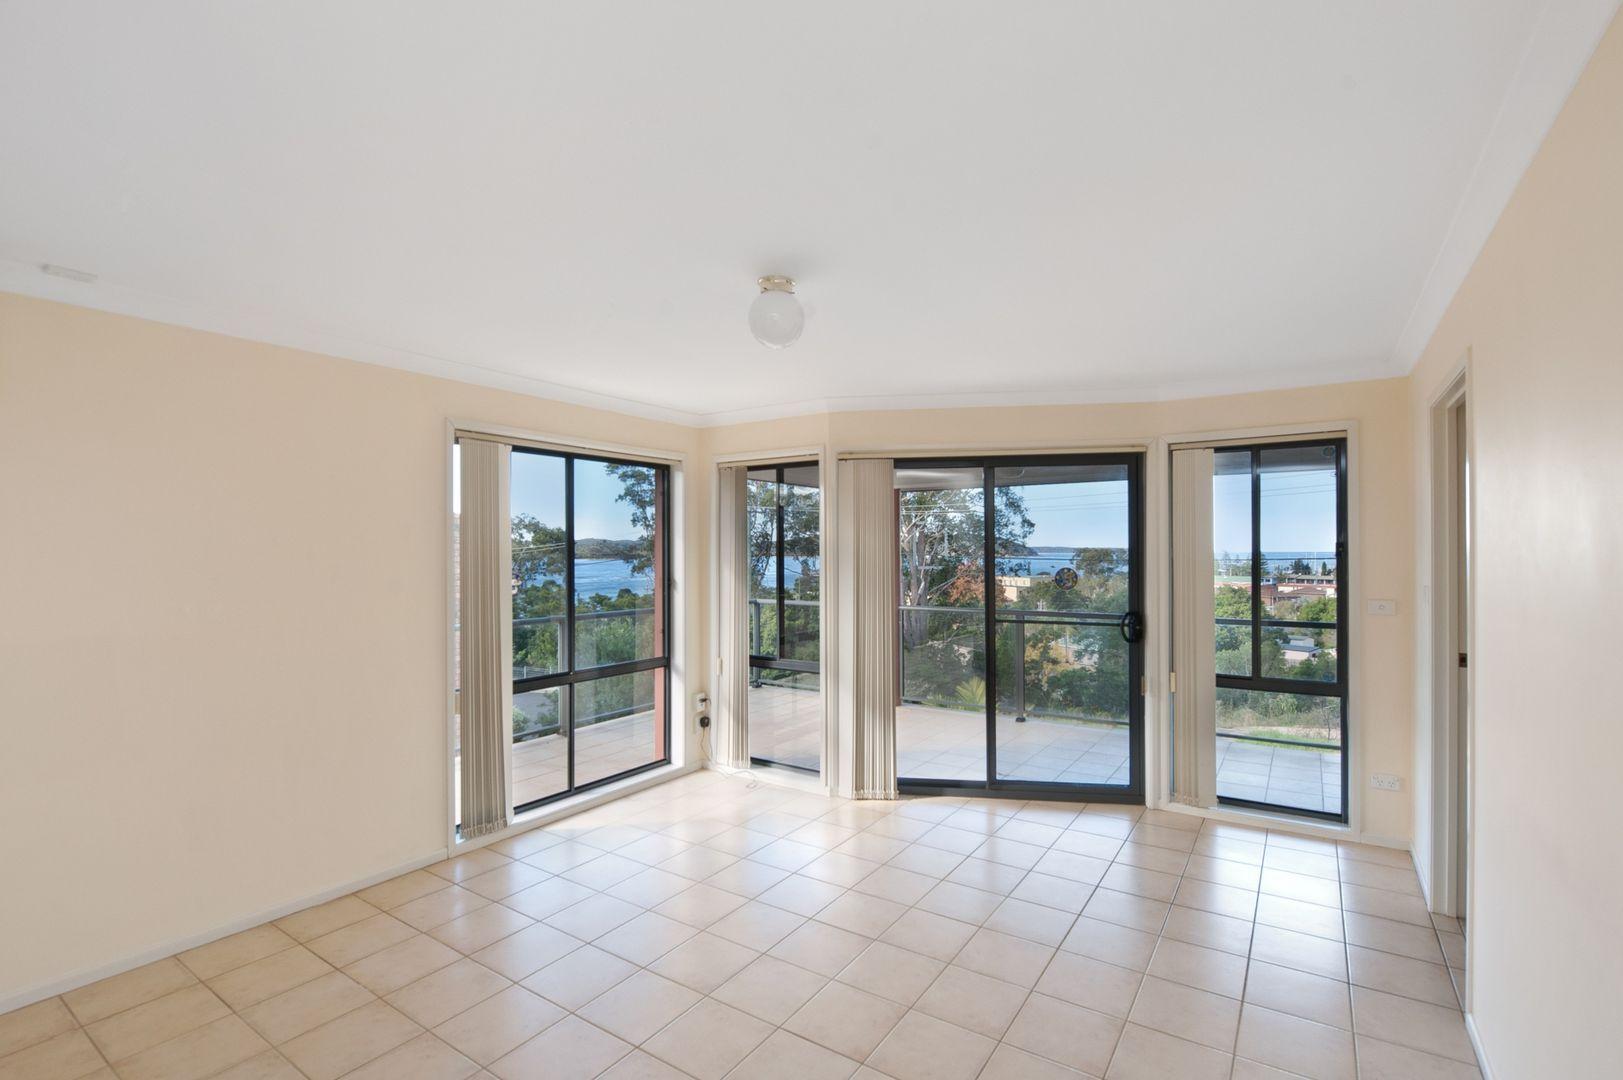 2/8 Pacific  Street, Batemans Bay NSW 2536, Image 1